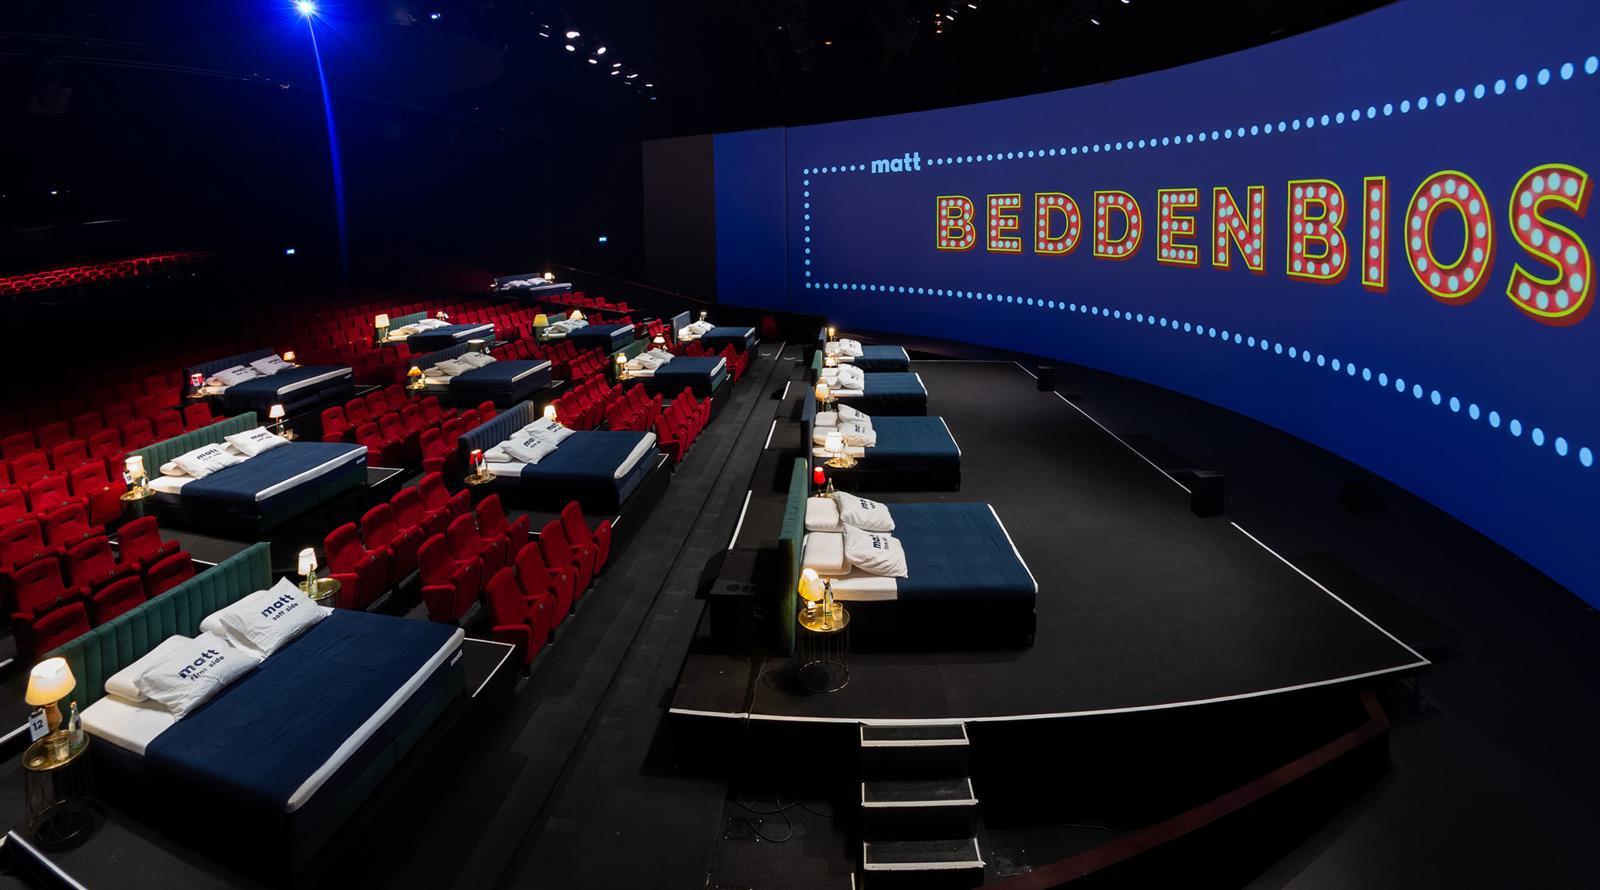 Beddenbioscoop Theater Amsterdam, Ligbioscoop